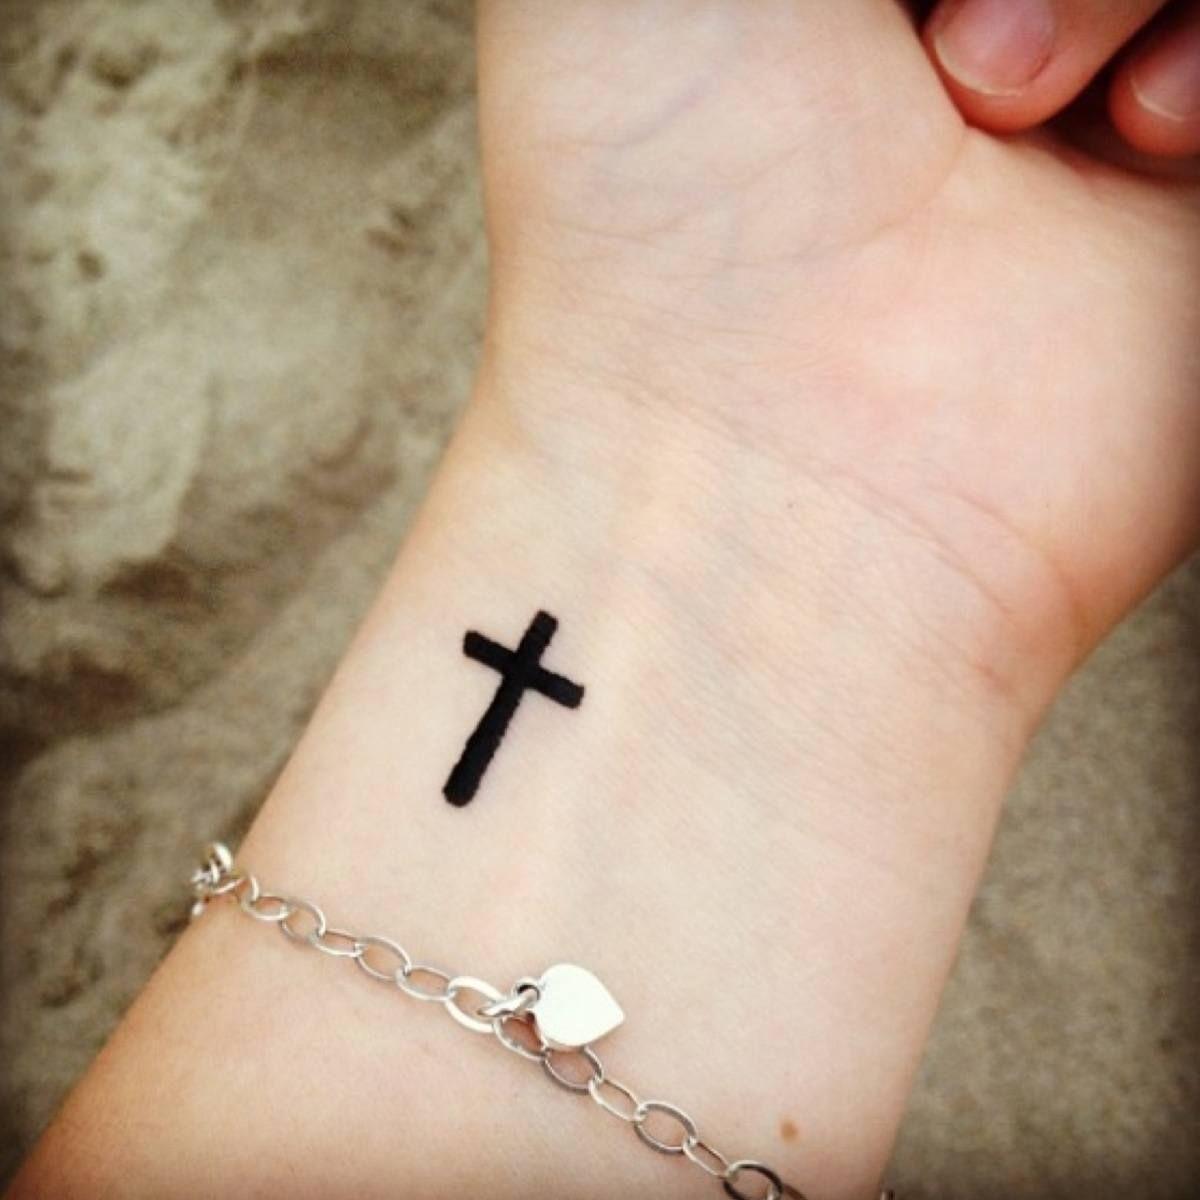 inspiring cute and small tattoos ideas for girls tattoo ideas